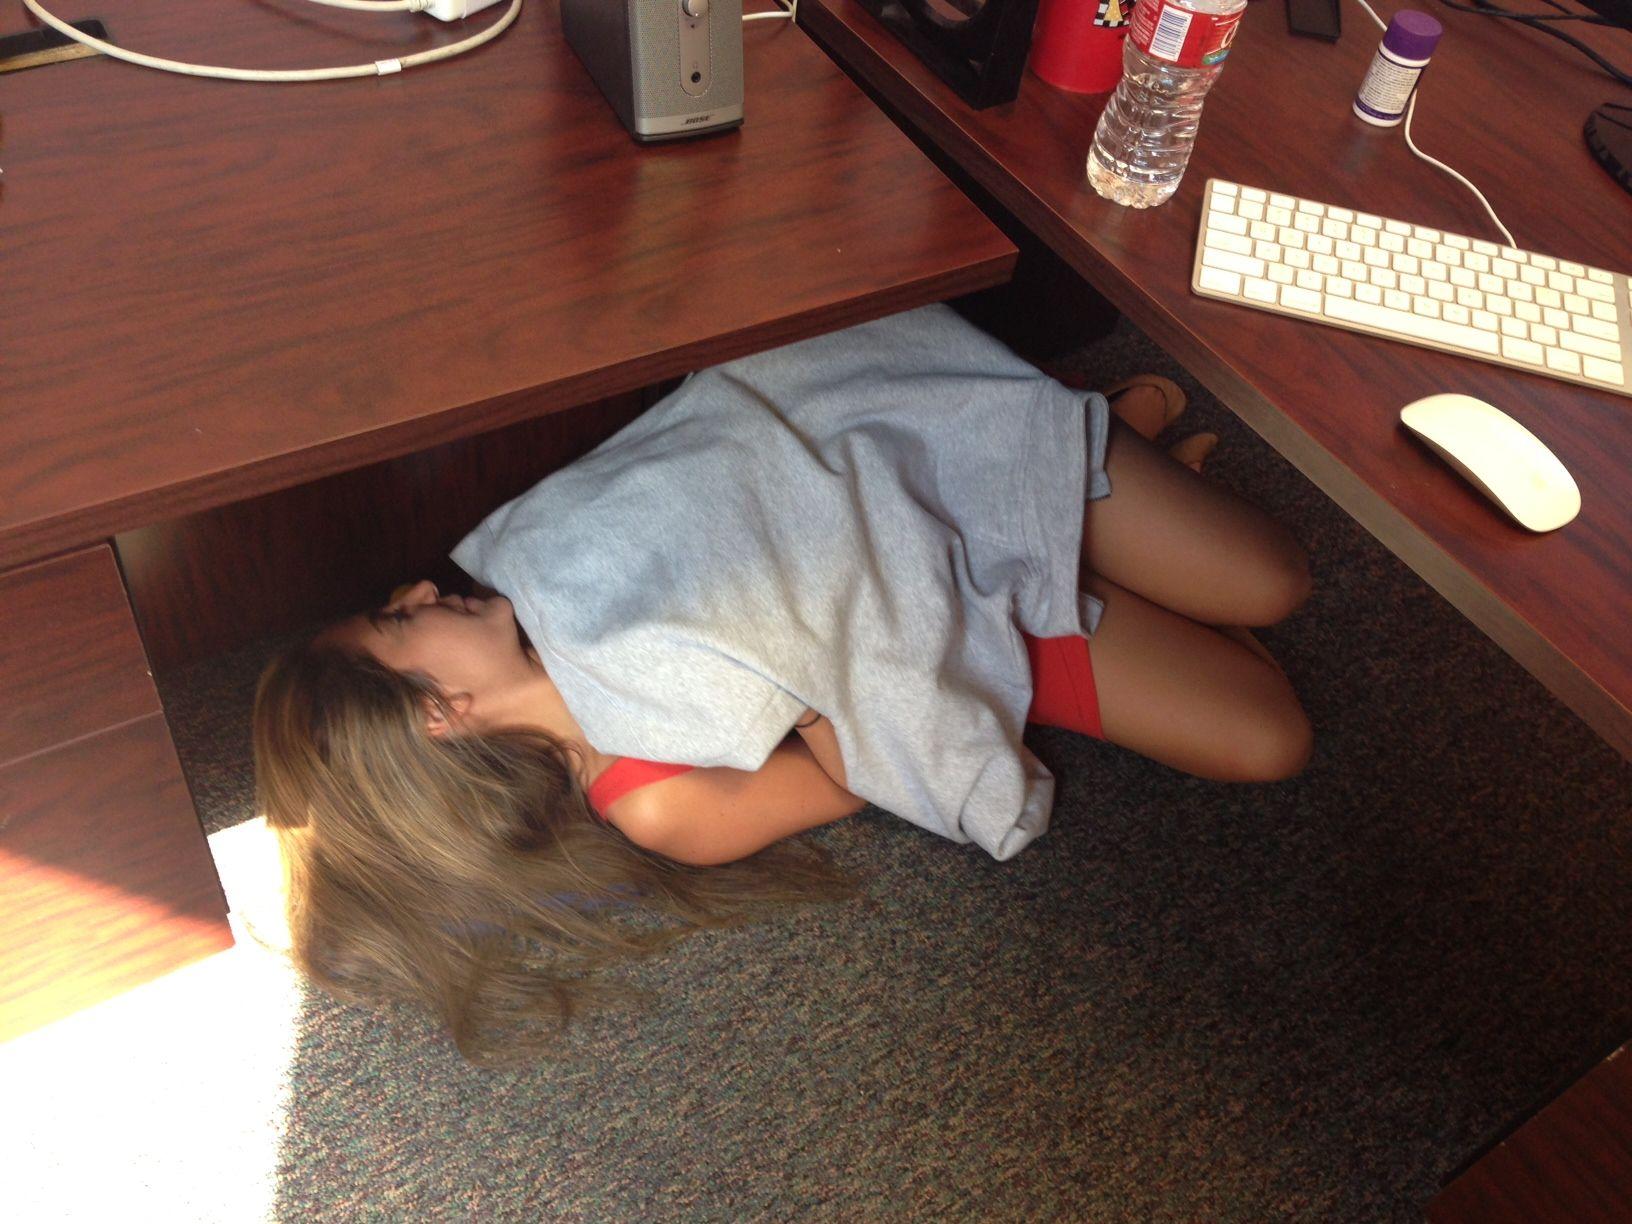 Post Grad Problems The Costanza The Under Your Desk Nap